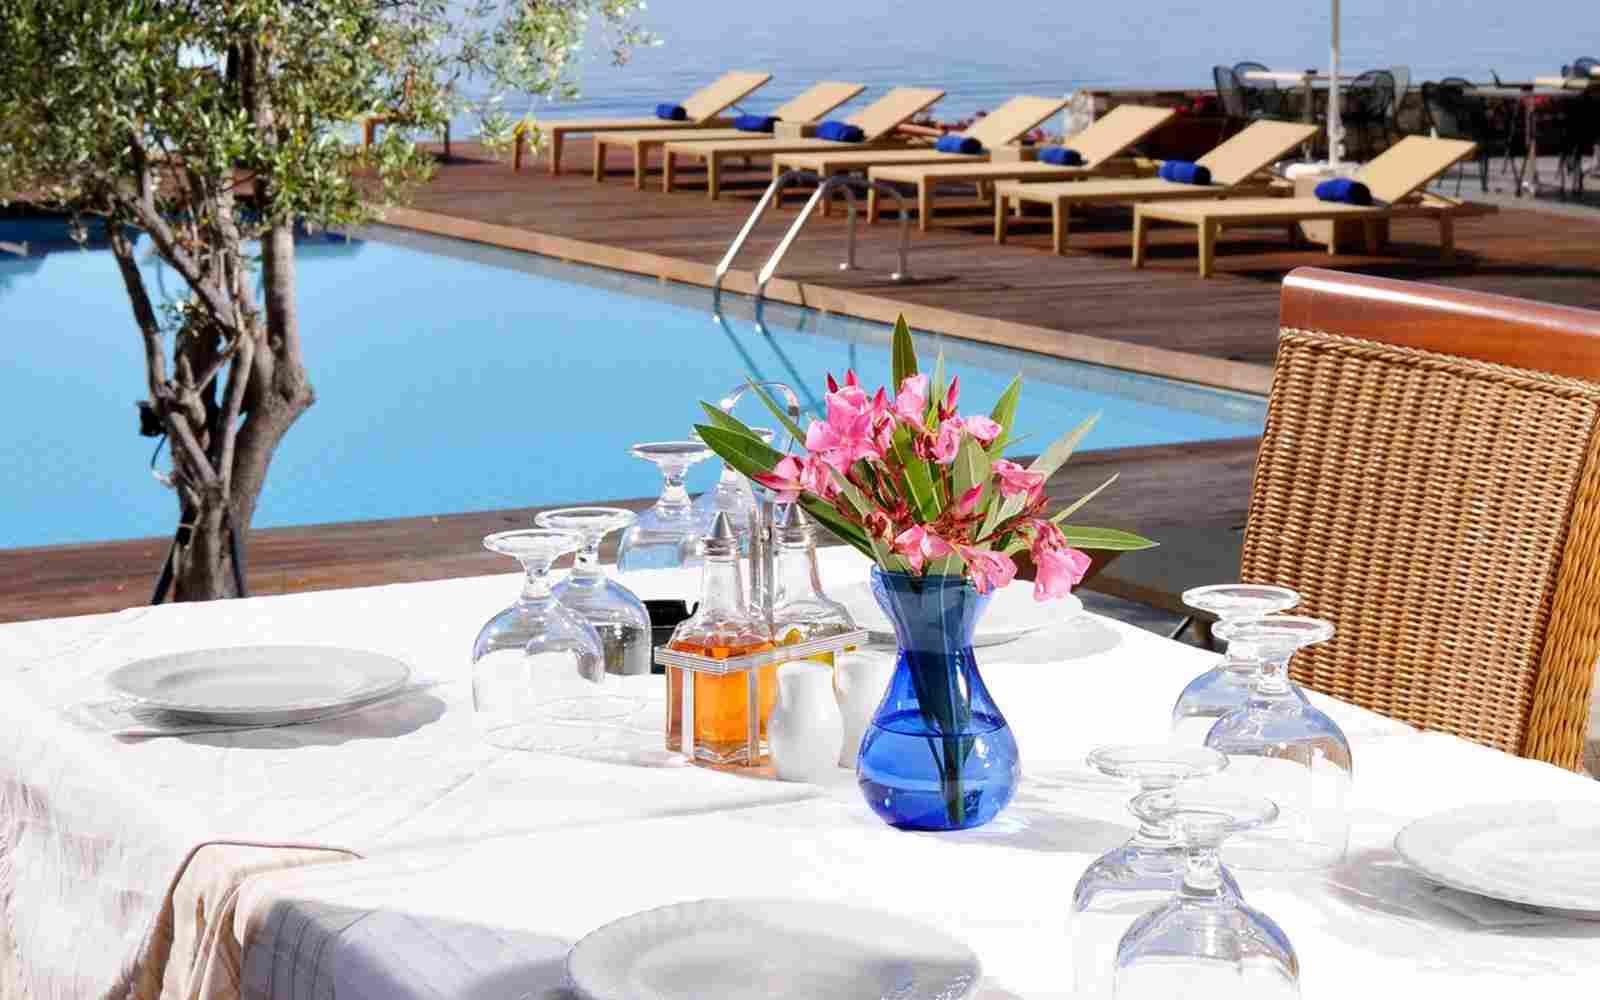 http://www.casacaribepuertomorelos.com/wp-content/uploads/2016/03/summer-hotel-09.jpg